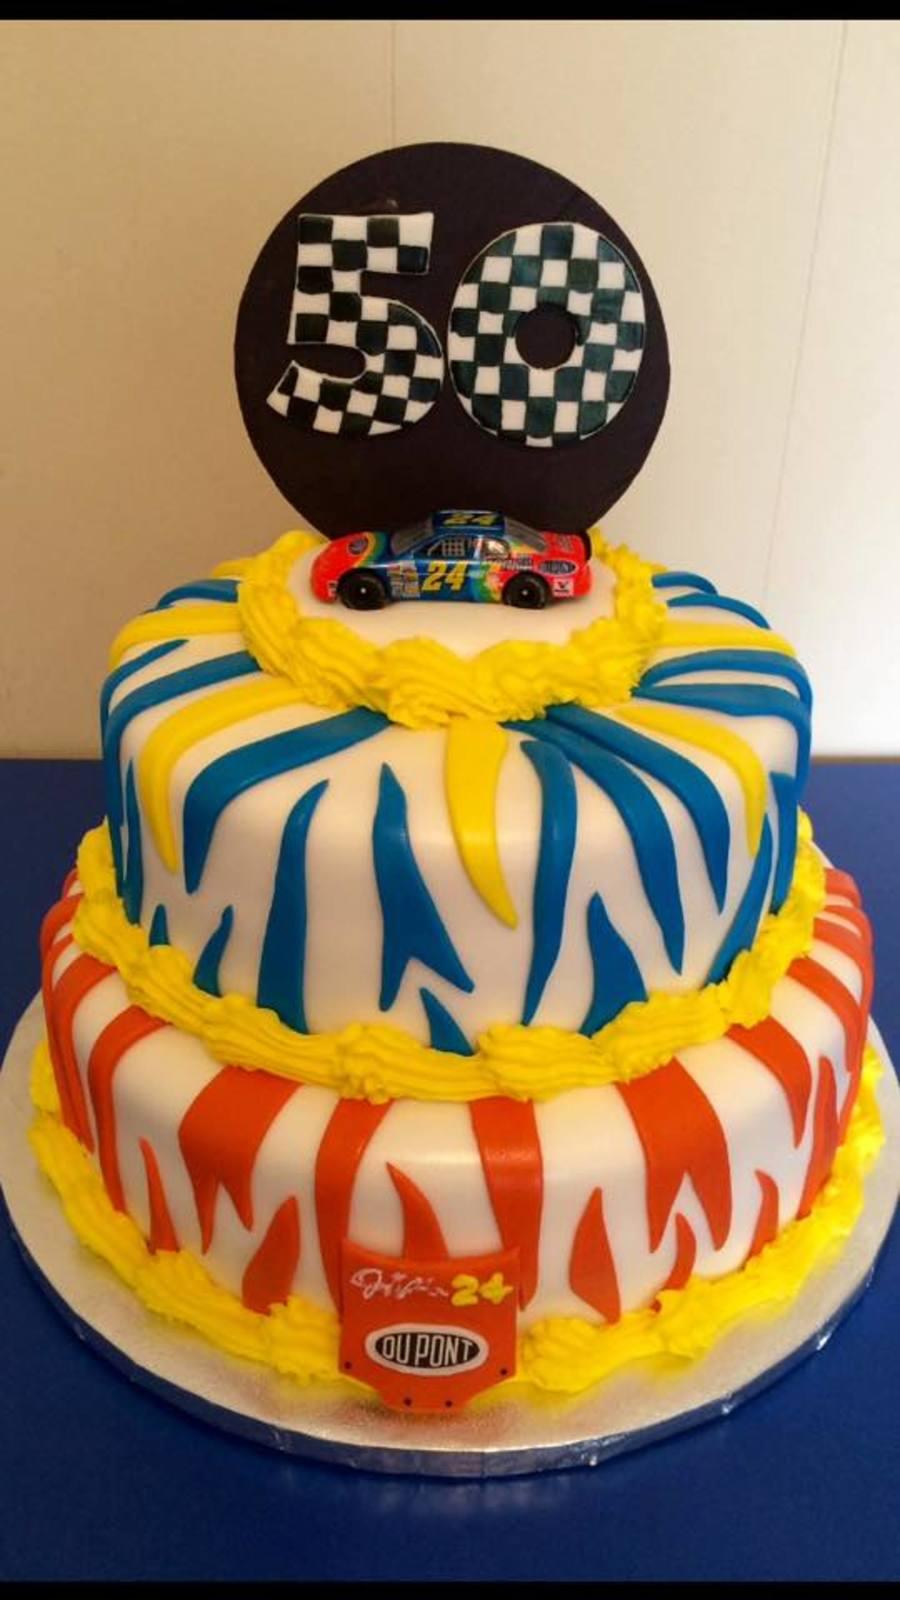 Jeff Gordon Fan 50th Birthday Cake Cakecentral